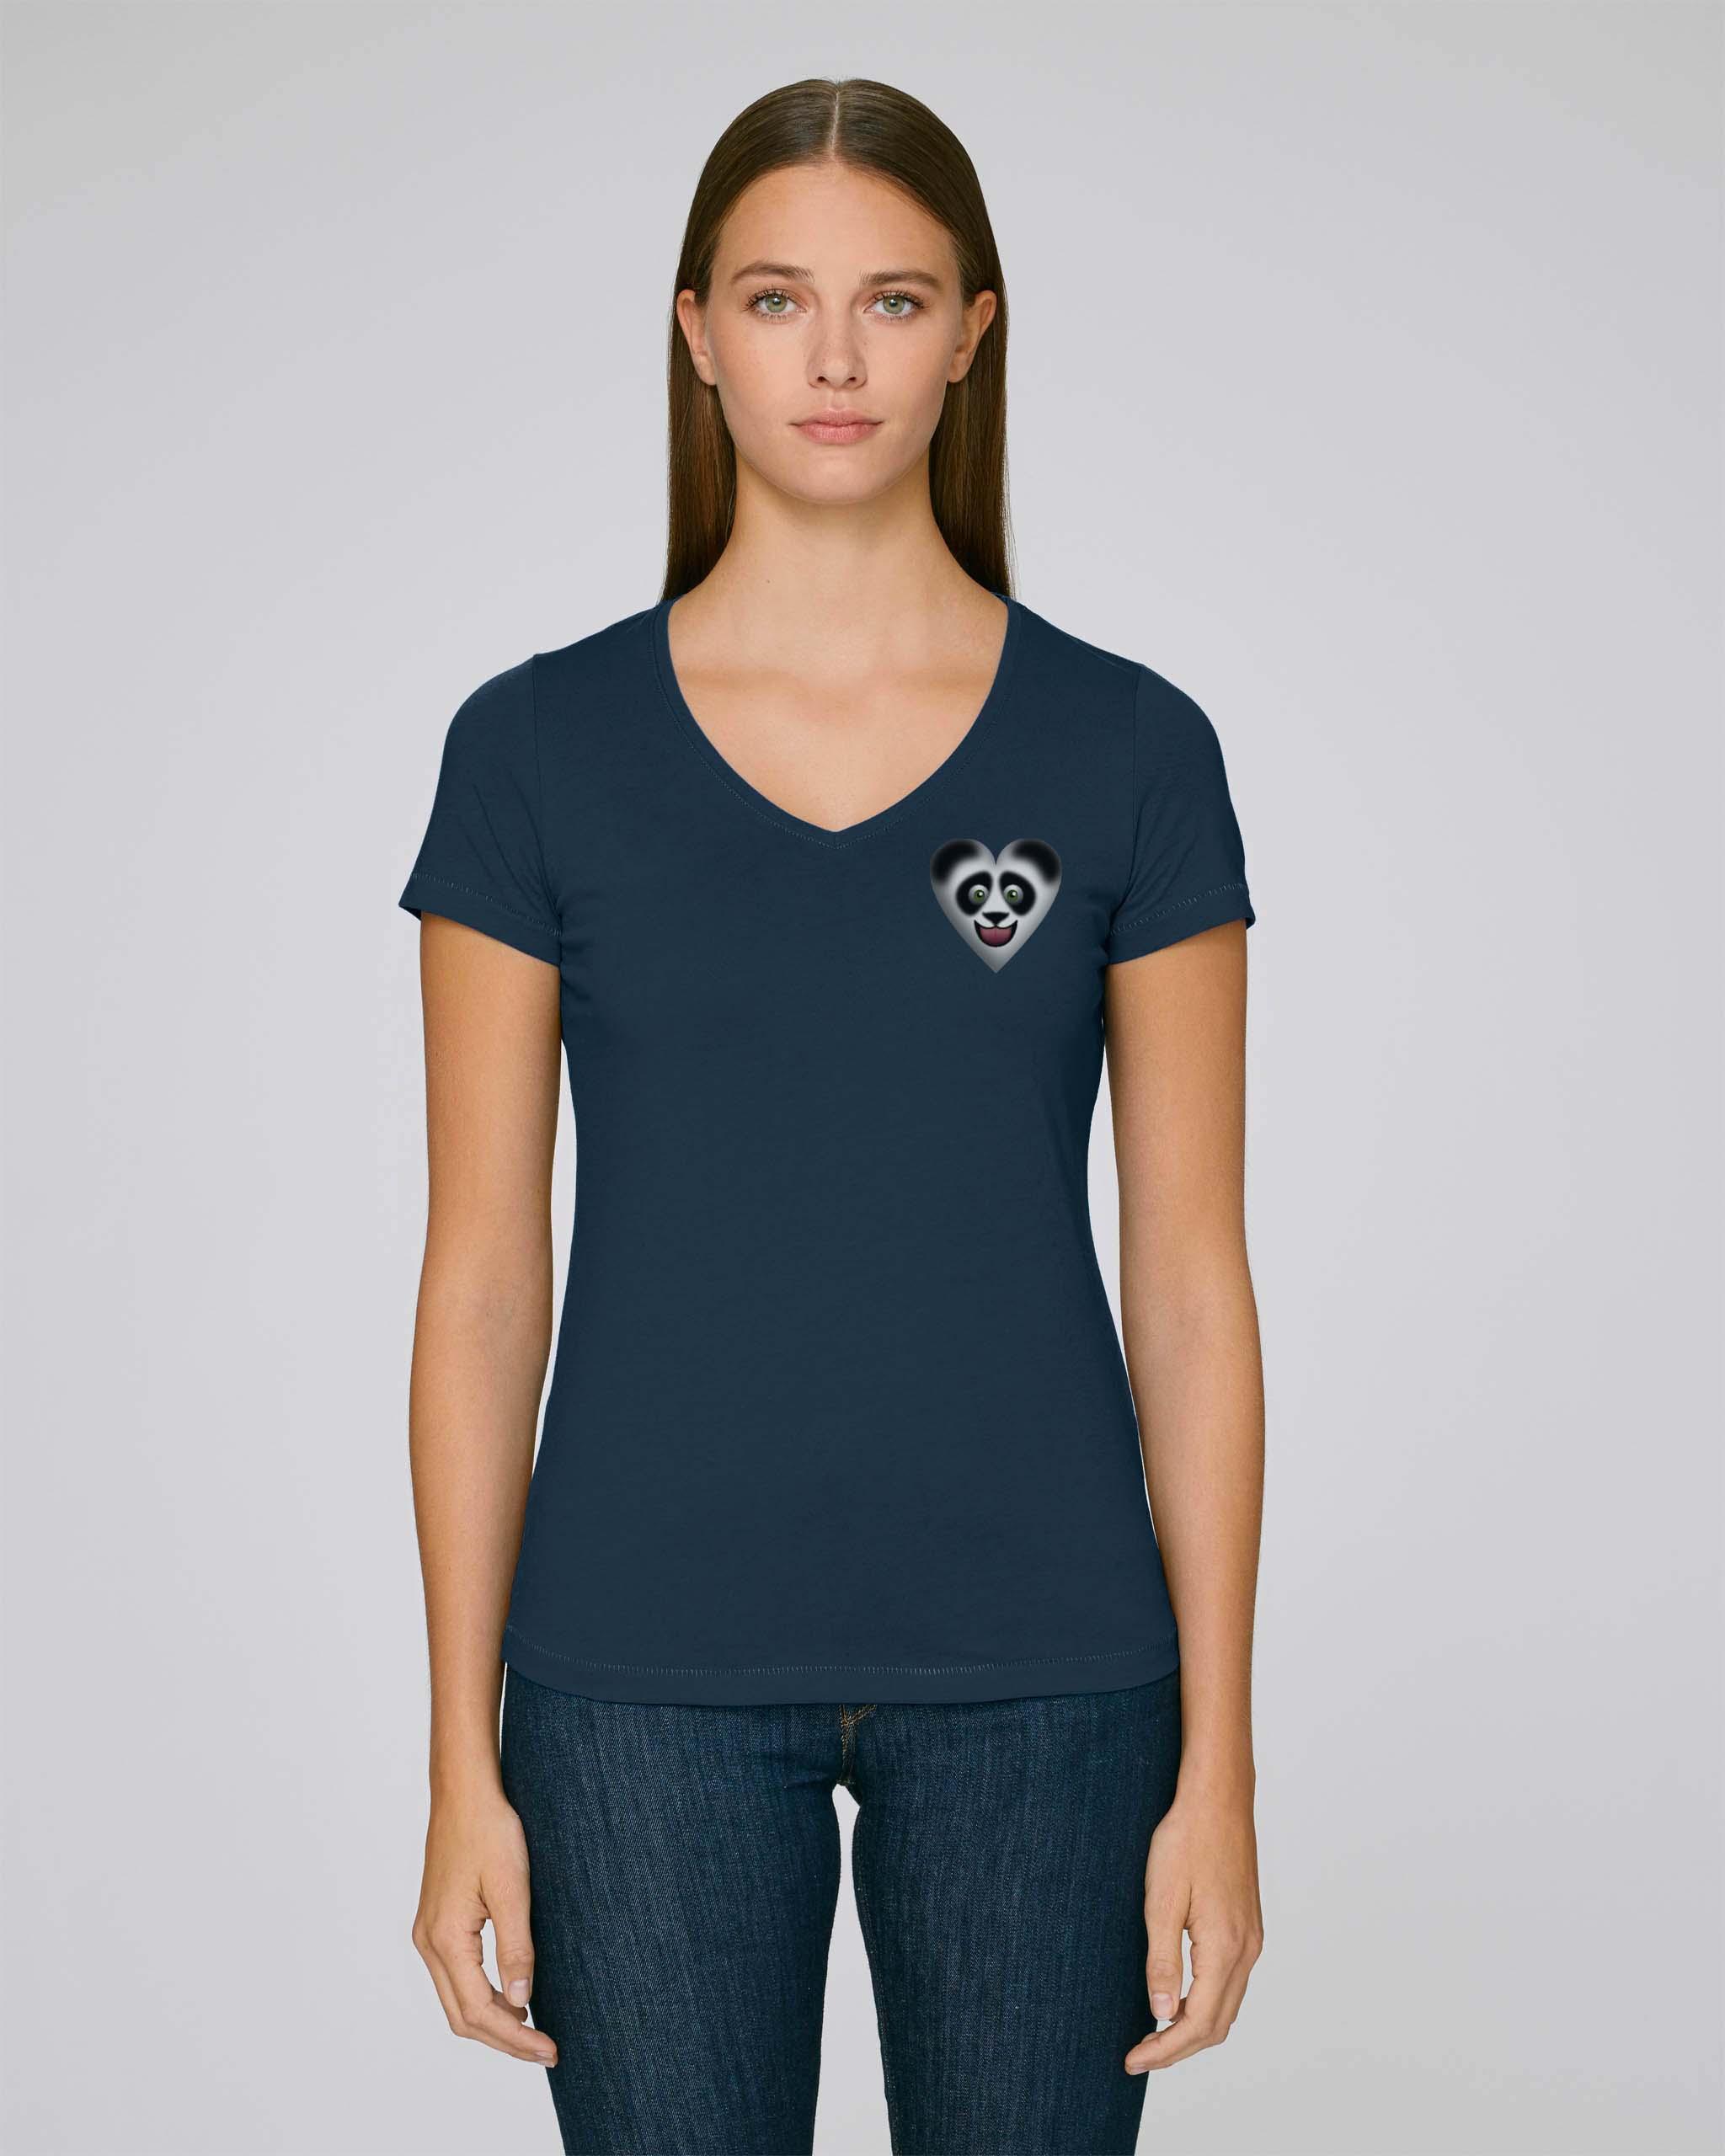 T-Shirt Bio bleu marine fonce Femme – Panda tee